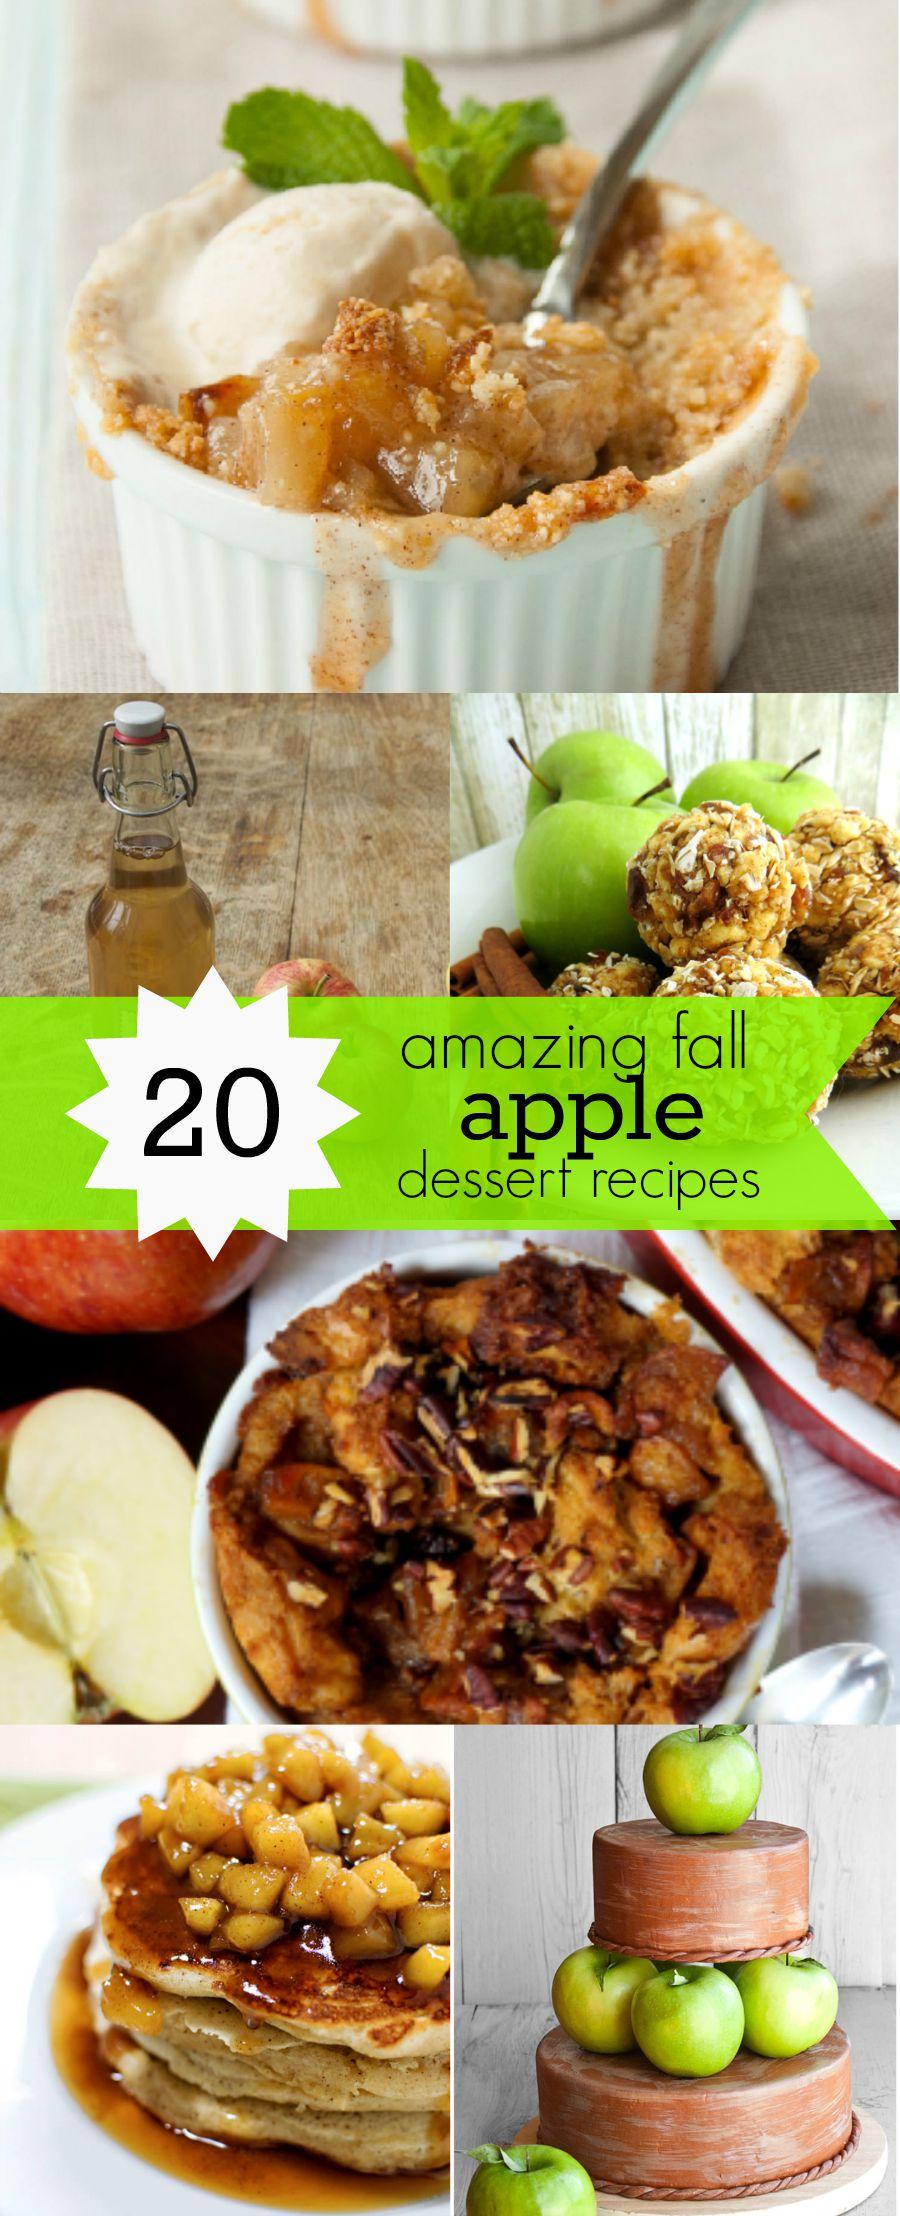 20 of the Best Fall Apple Dessert Recipes